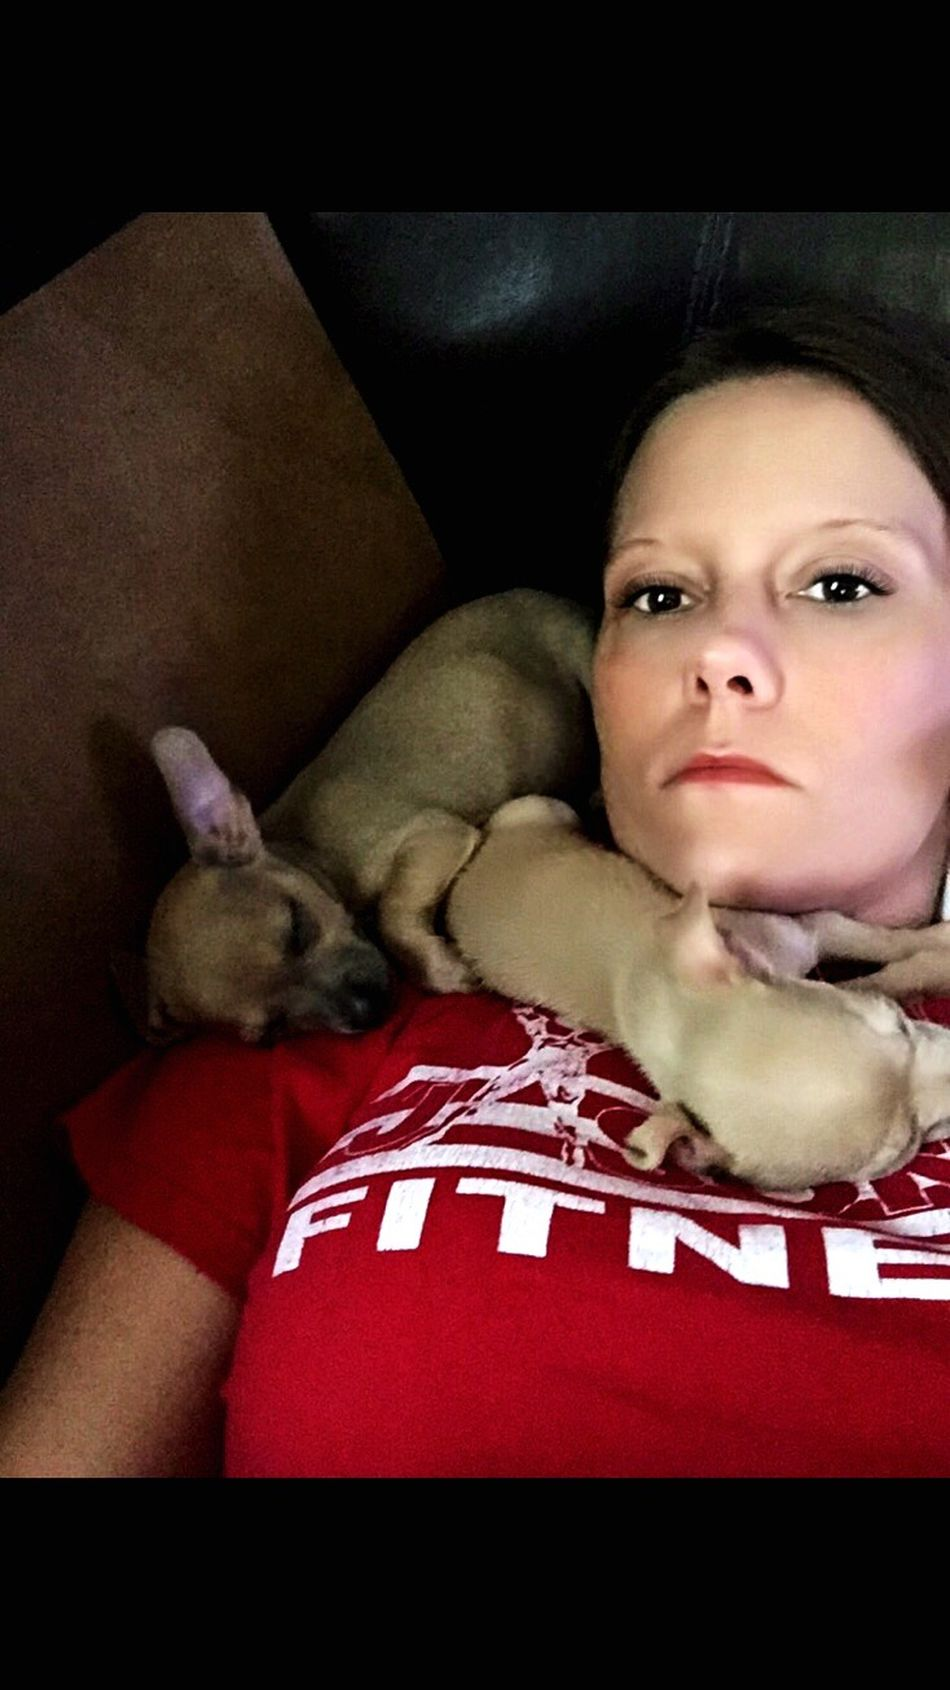 Chihuahualovers Chihuahua Mybabies❤️ SnuggleBuddies Love Them ❤ Bigears Mydog♡ Sotiny